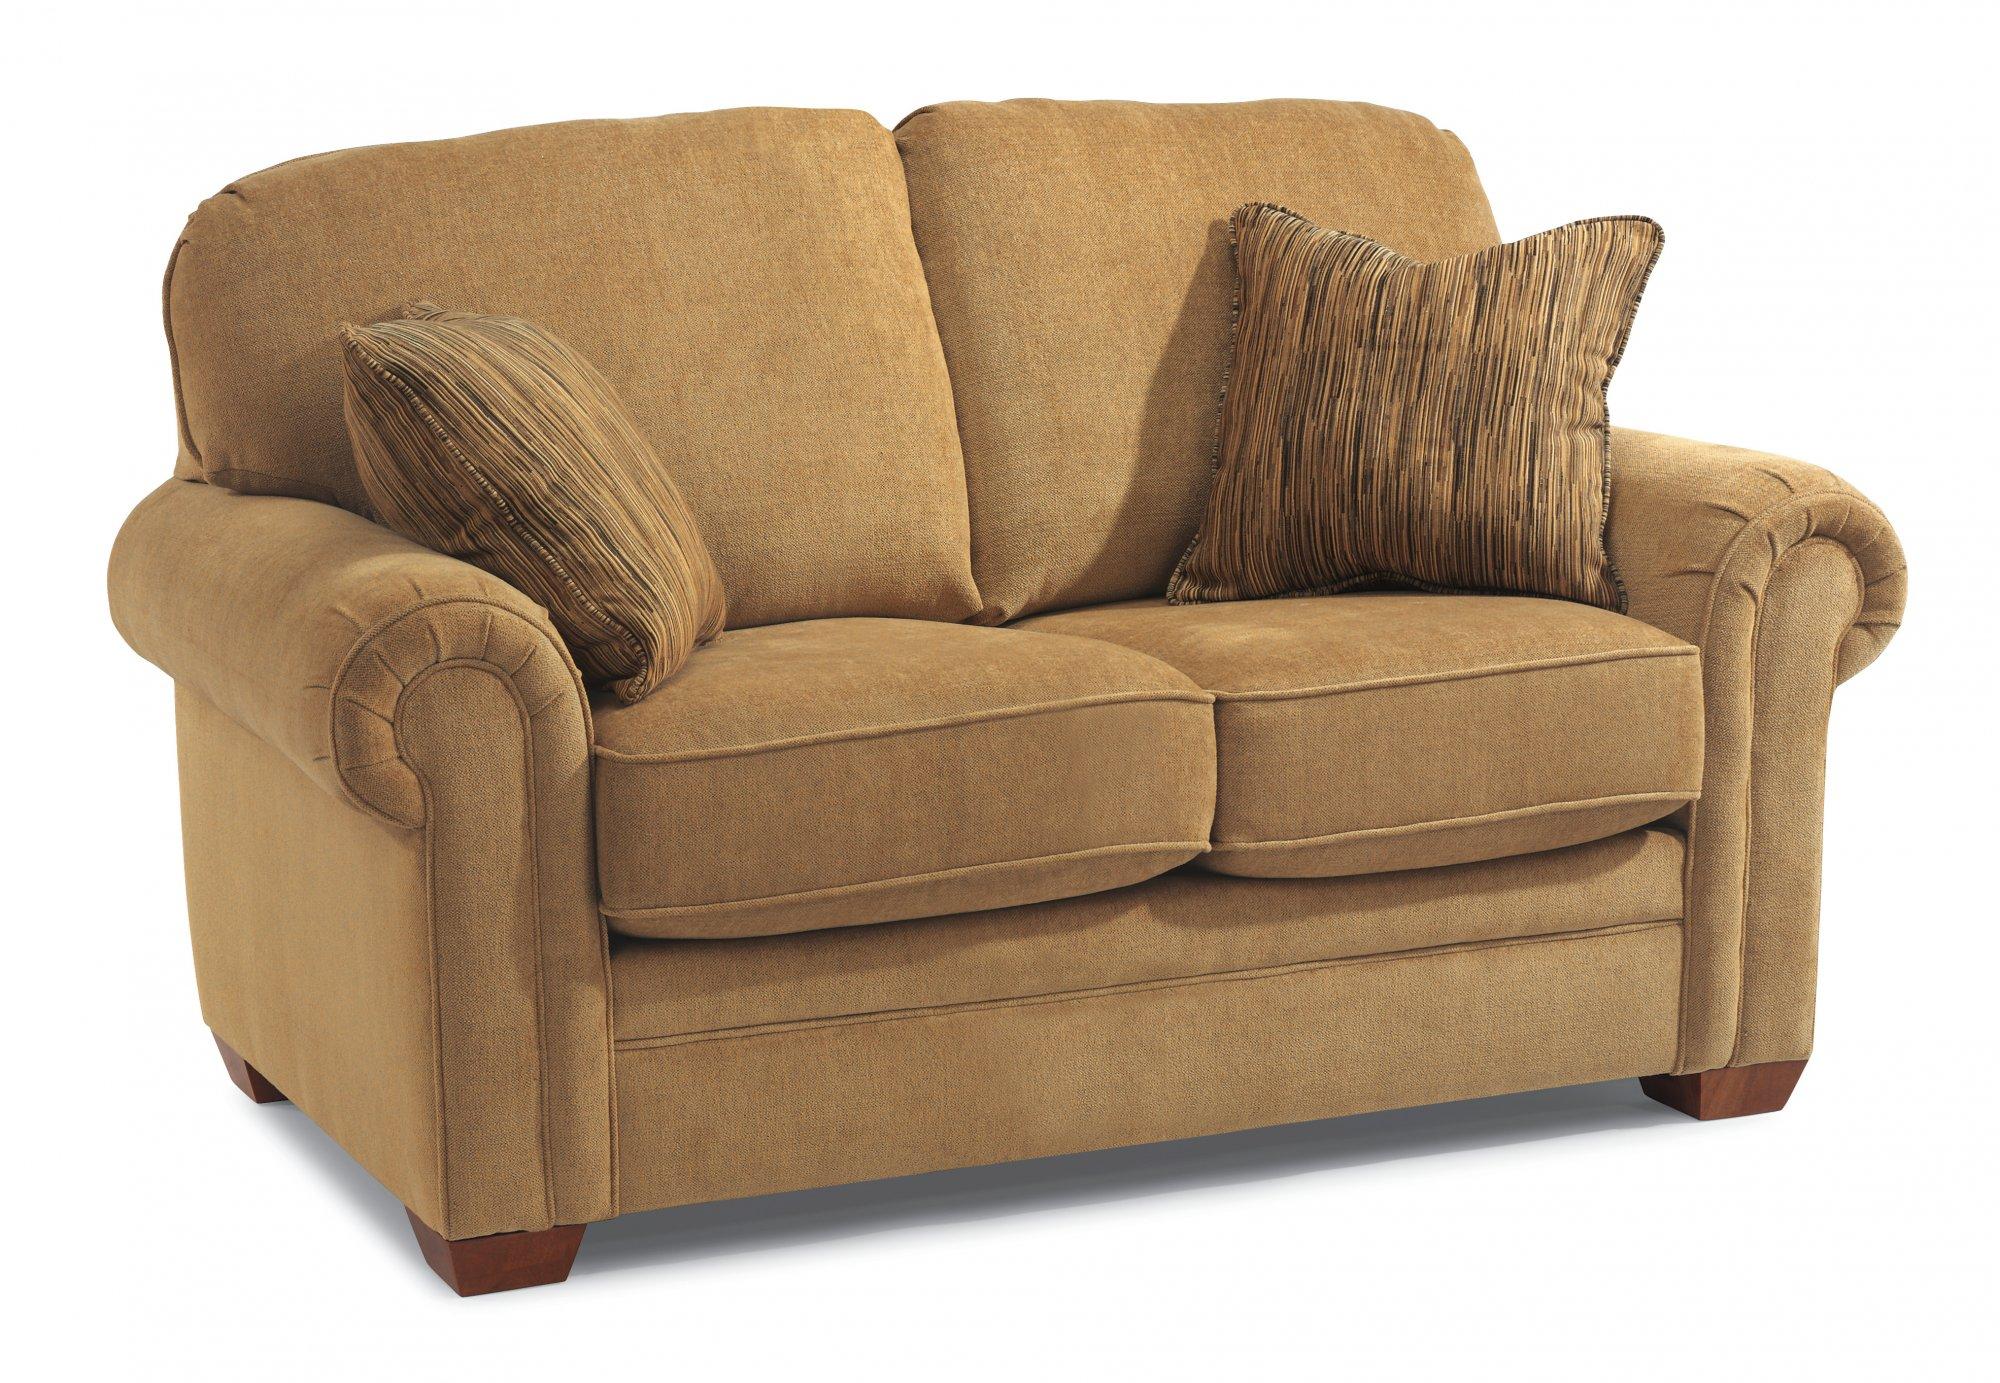 Superb Harrison Flexsteel Com Creativecarmelina Interior Chair Design Creativecarmelinacom